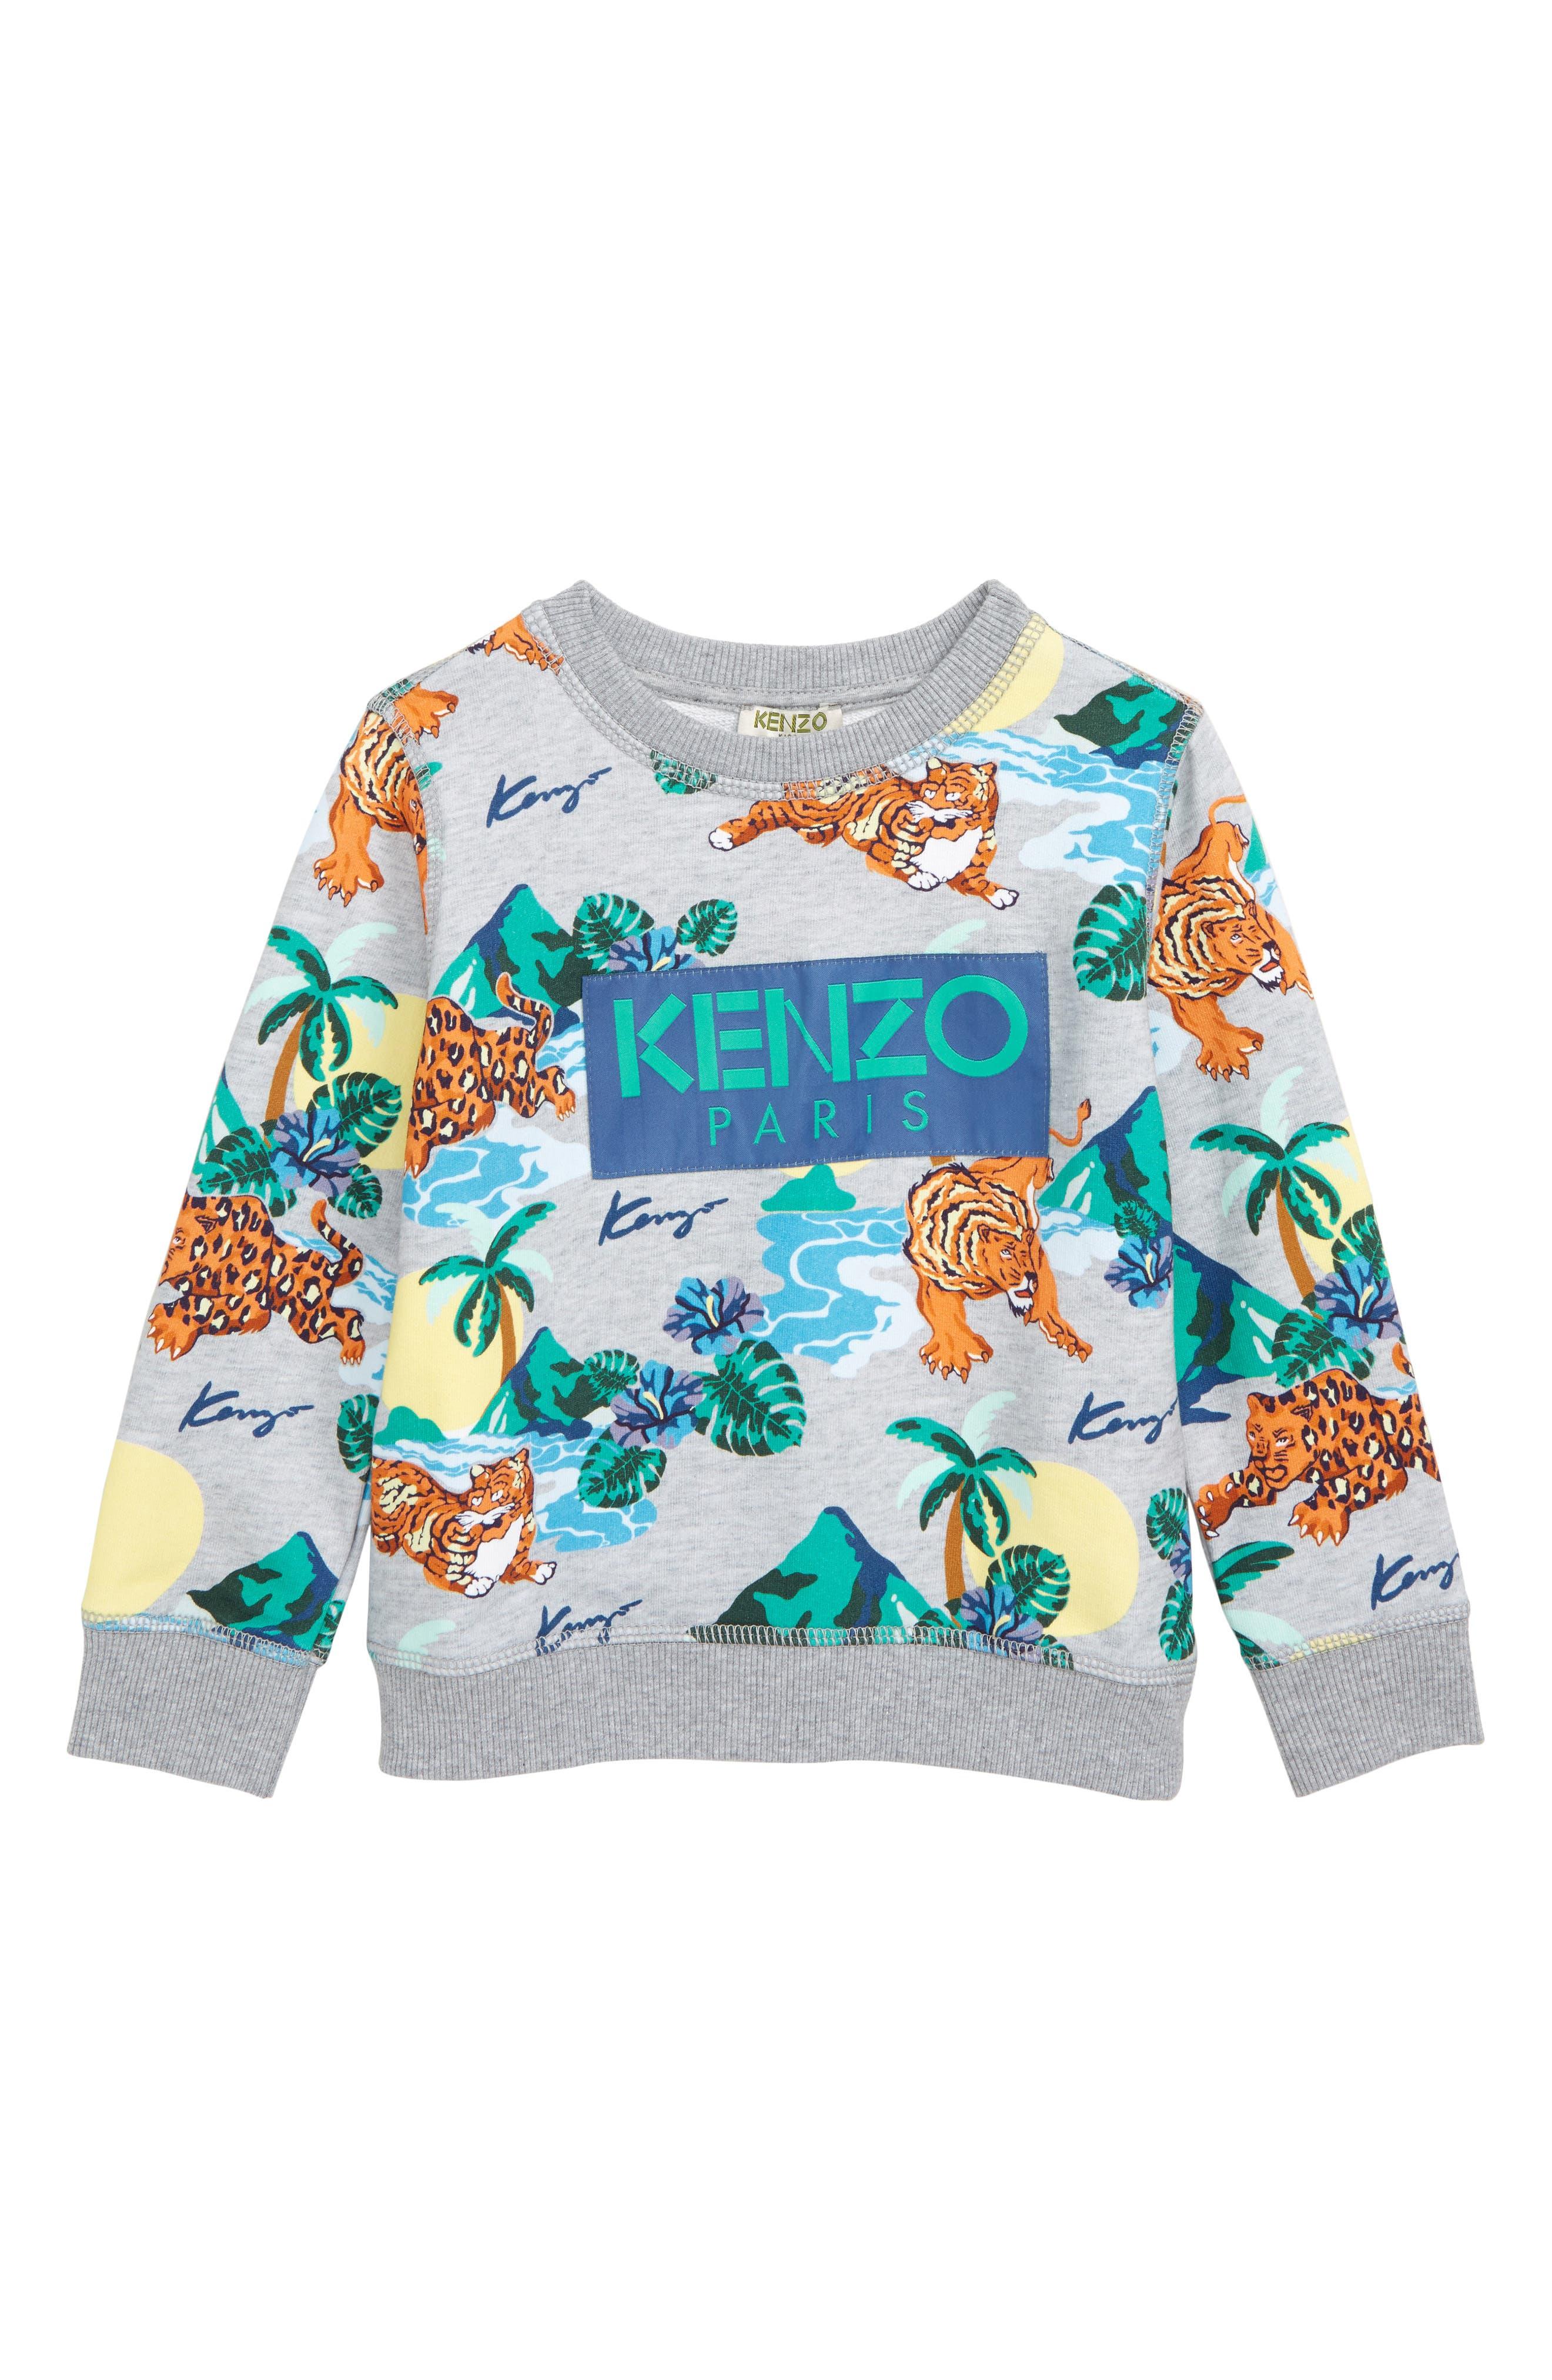 KENZO, Tropical Print Sweatshirt, Main thumbnail 1, color, MARL GREY